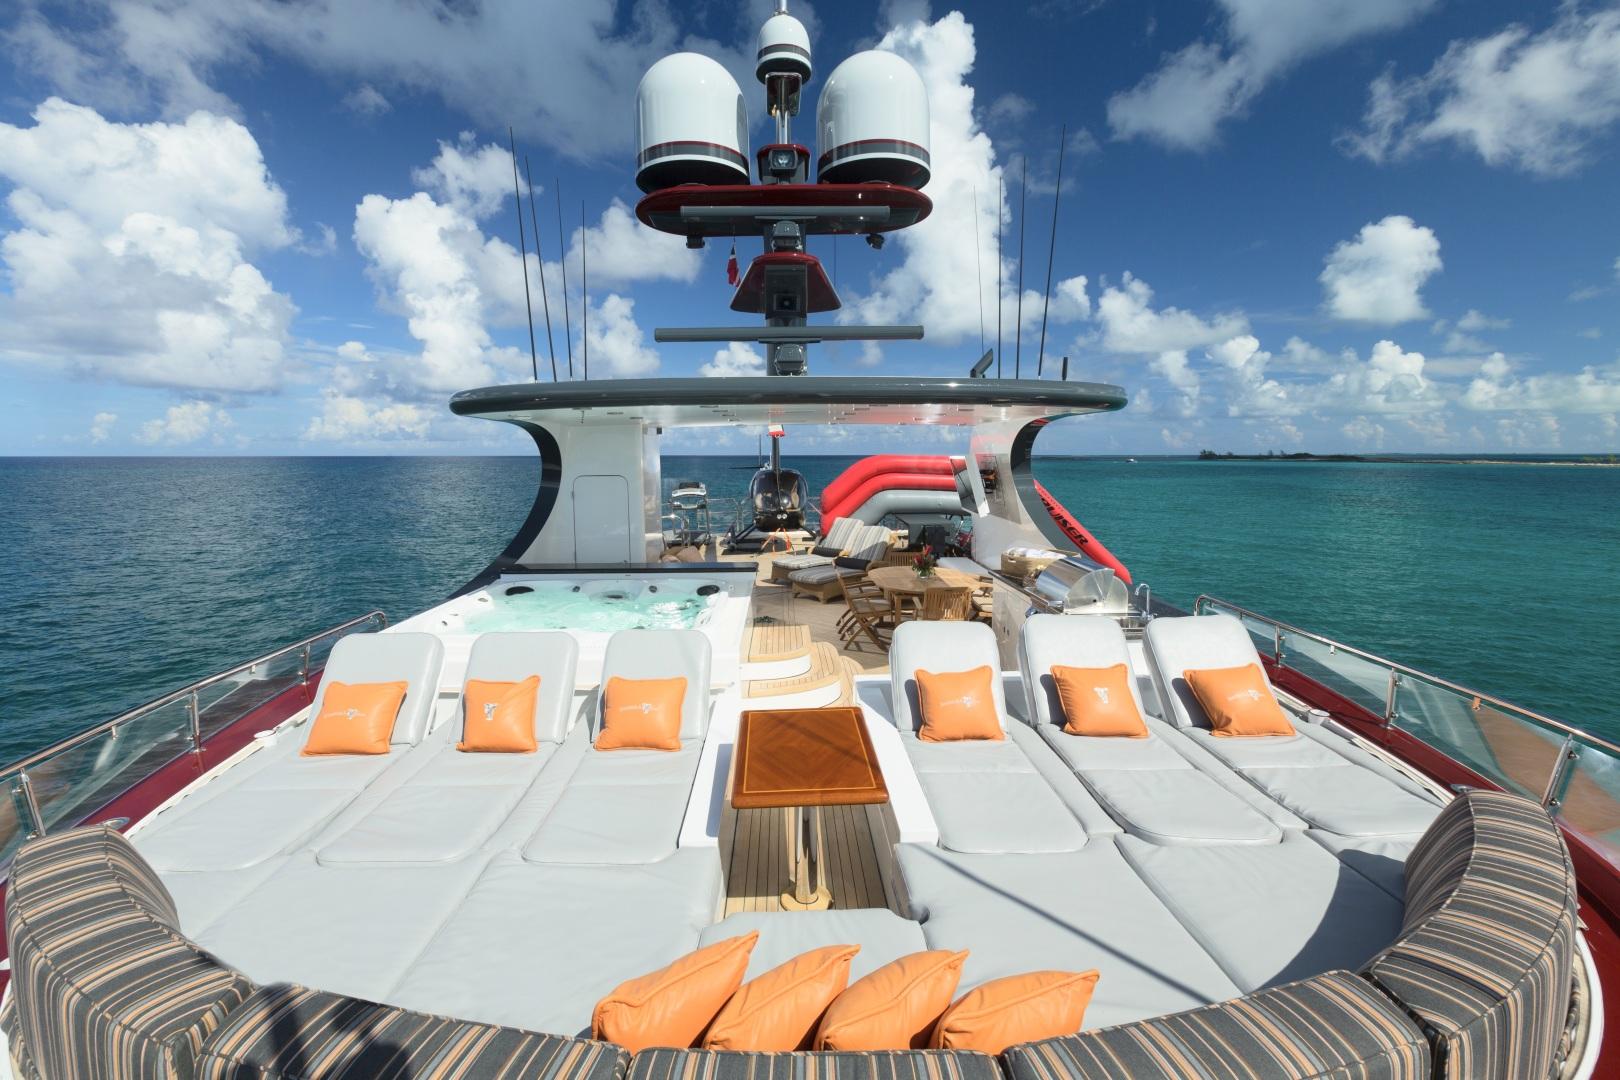 Trinity Yachts-164 Tri-deck Motor Yacht 2008-Amarula Sun Fort Lauderdale-Florida-United States-Sun Deck Lounge Area & Hot Tub-1513959 | Thumbnail